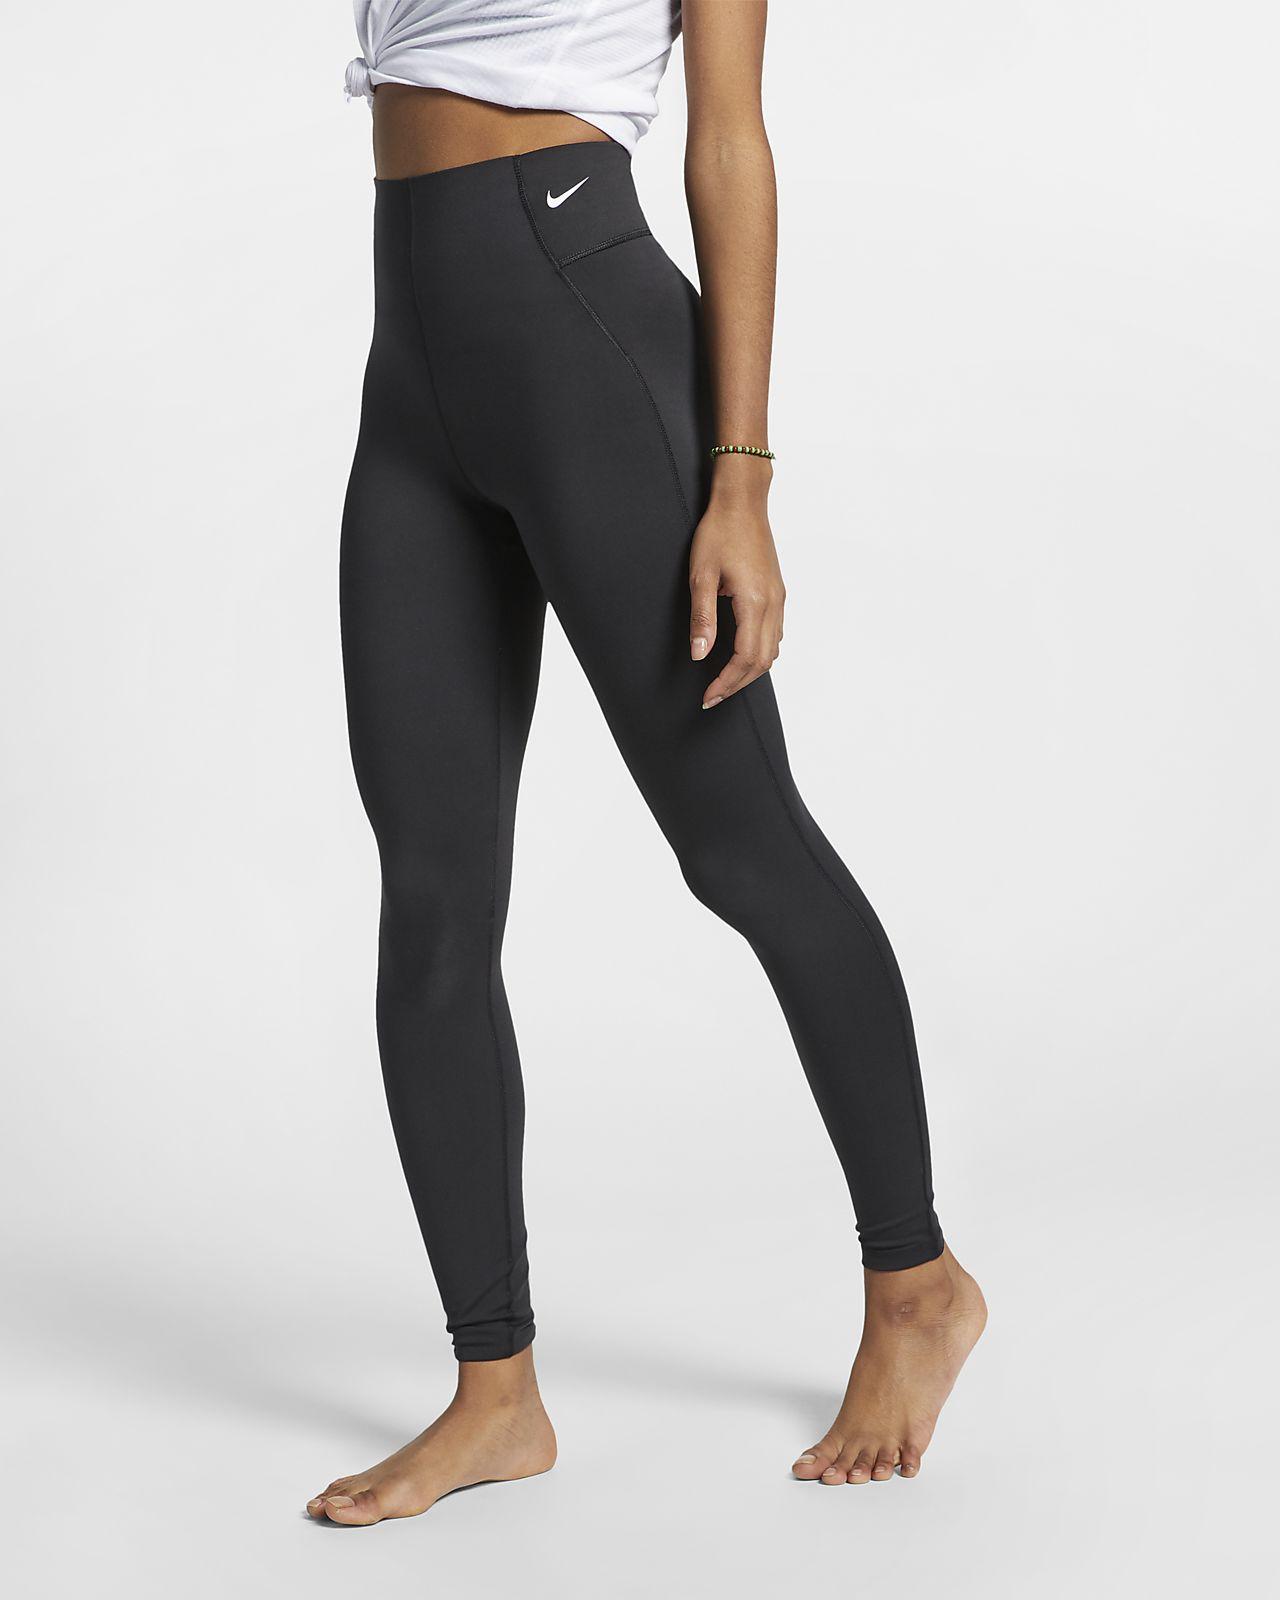 Nike Sculpt Yogatrainingstights voor dames